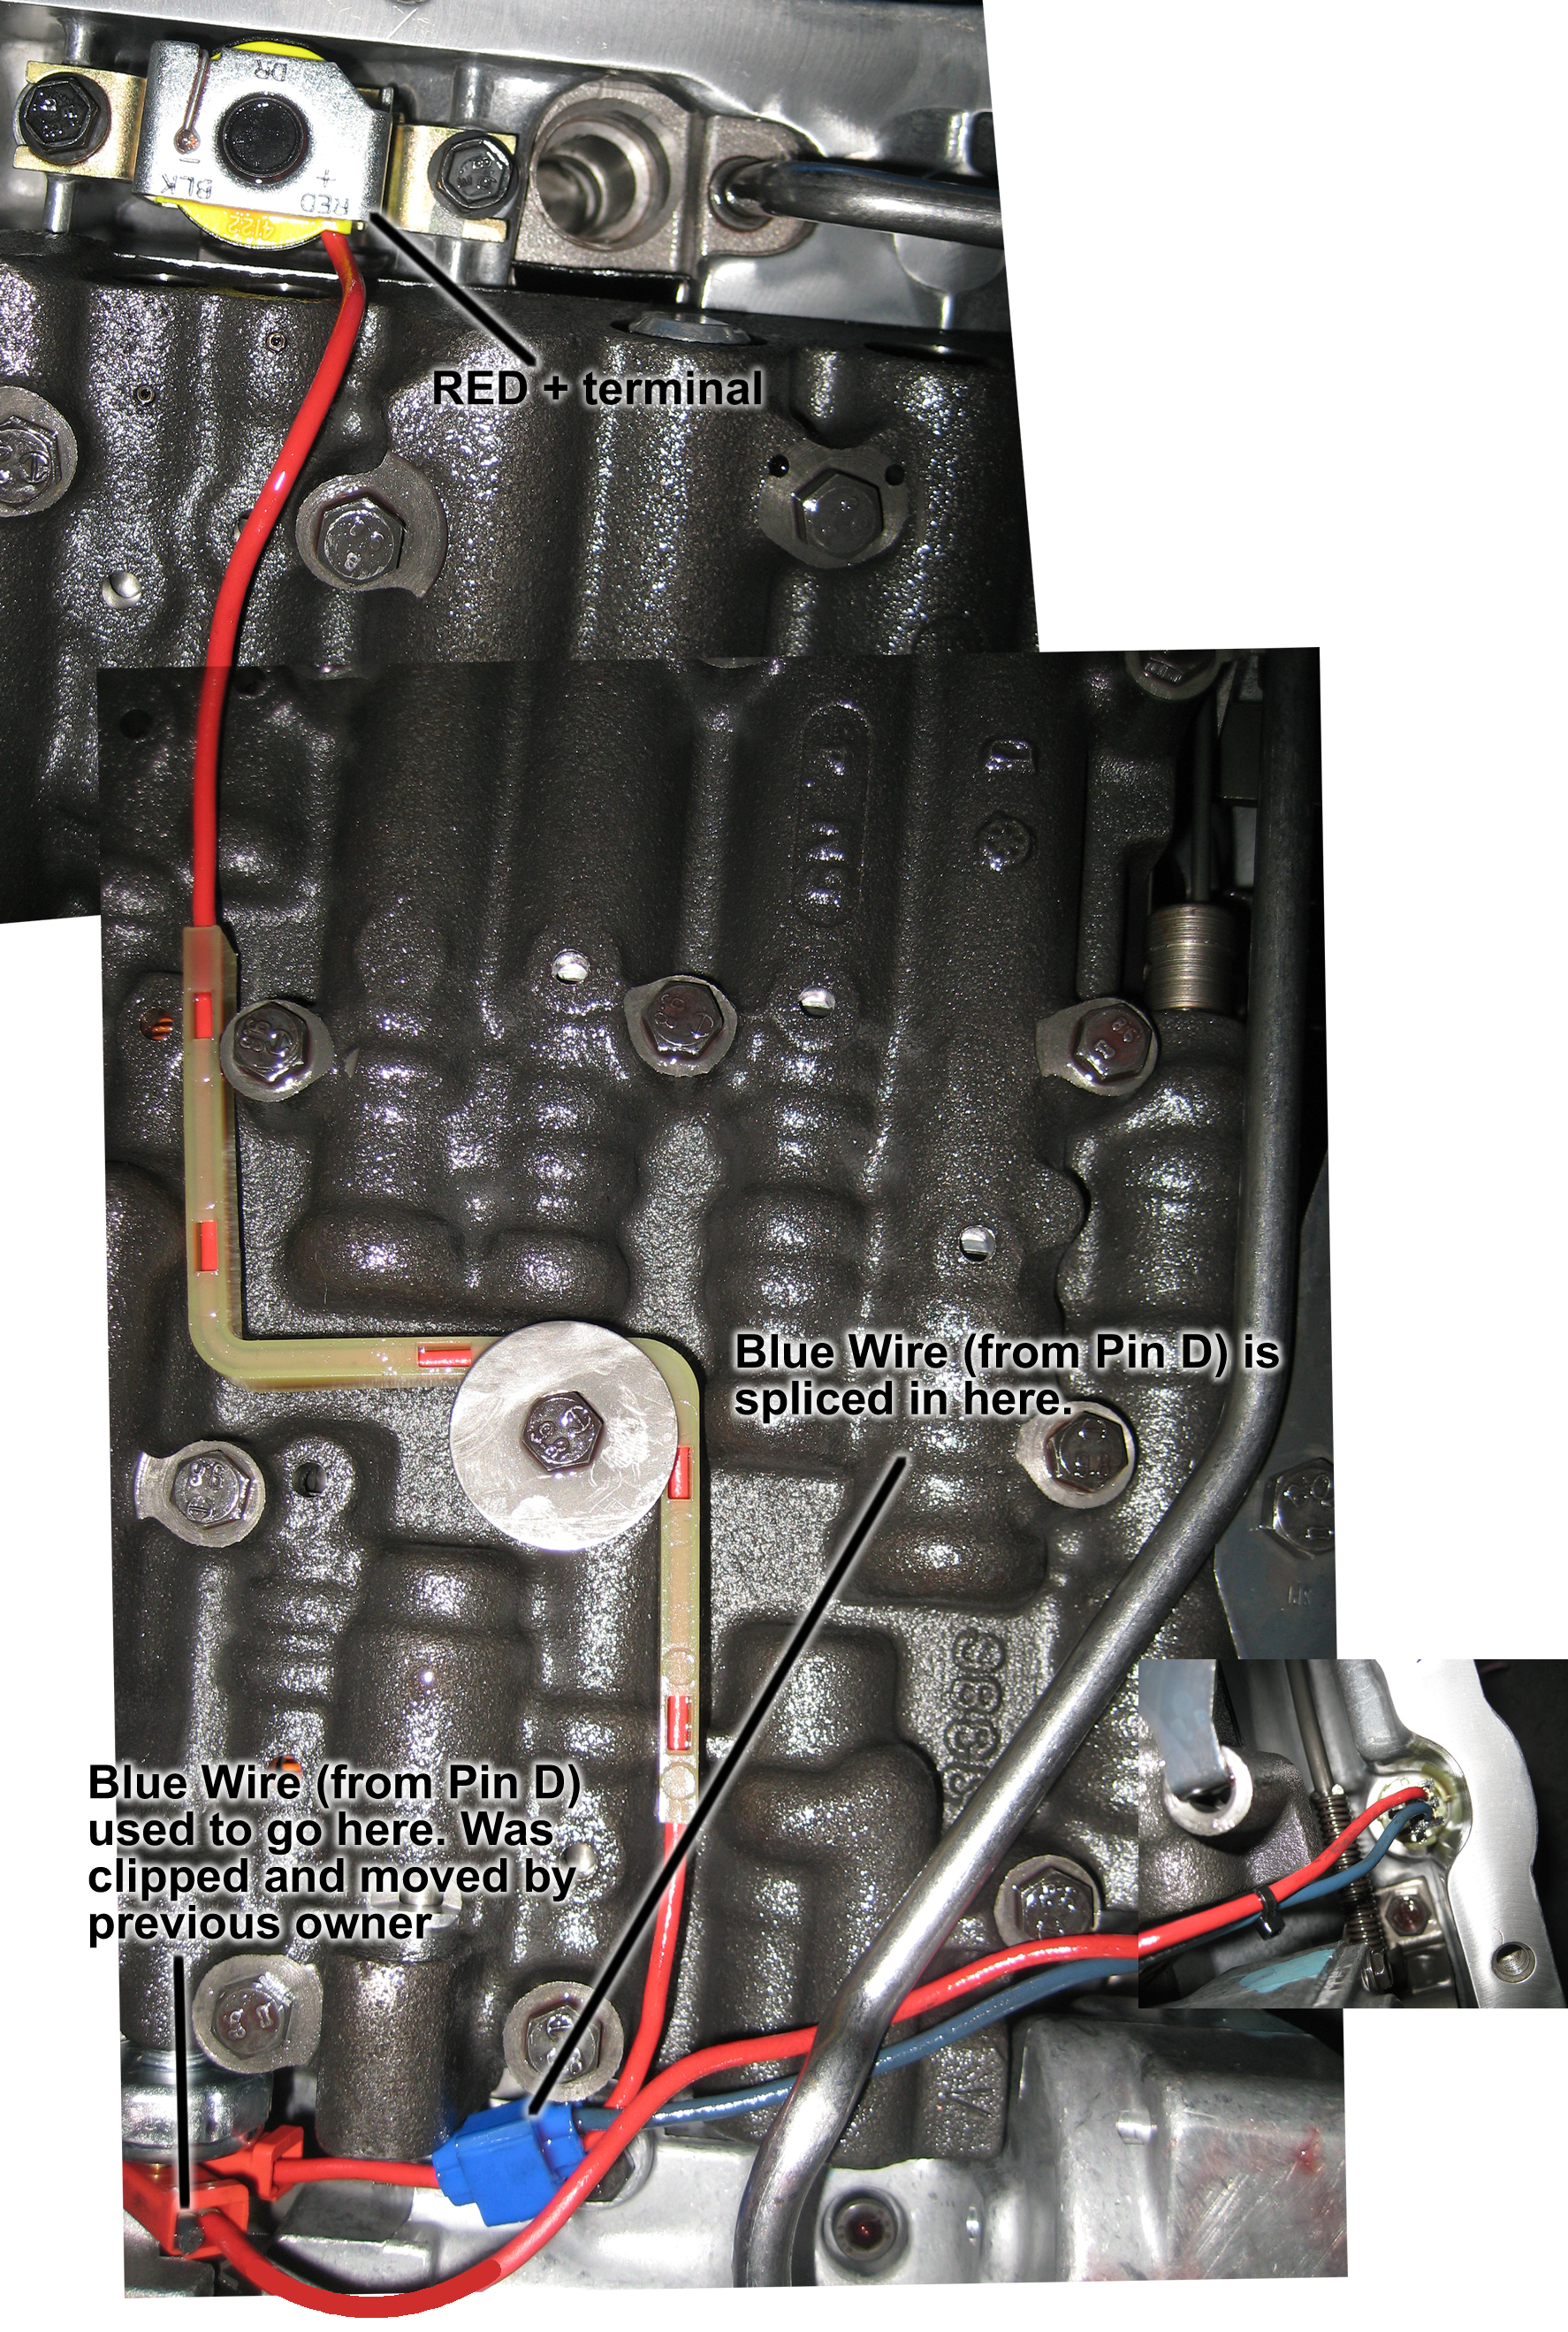 700R4 Tcc/lockup Wiring - The Bangshift Forums - 700R4 Lockup Wiring Diagram